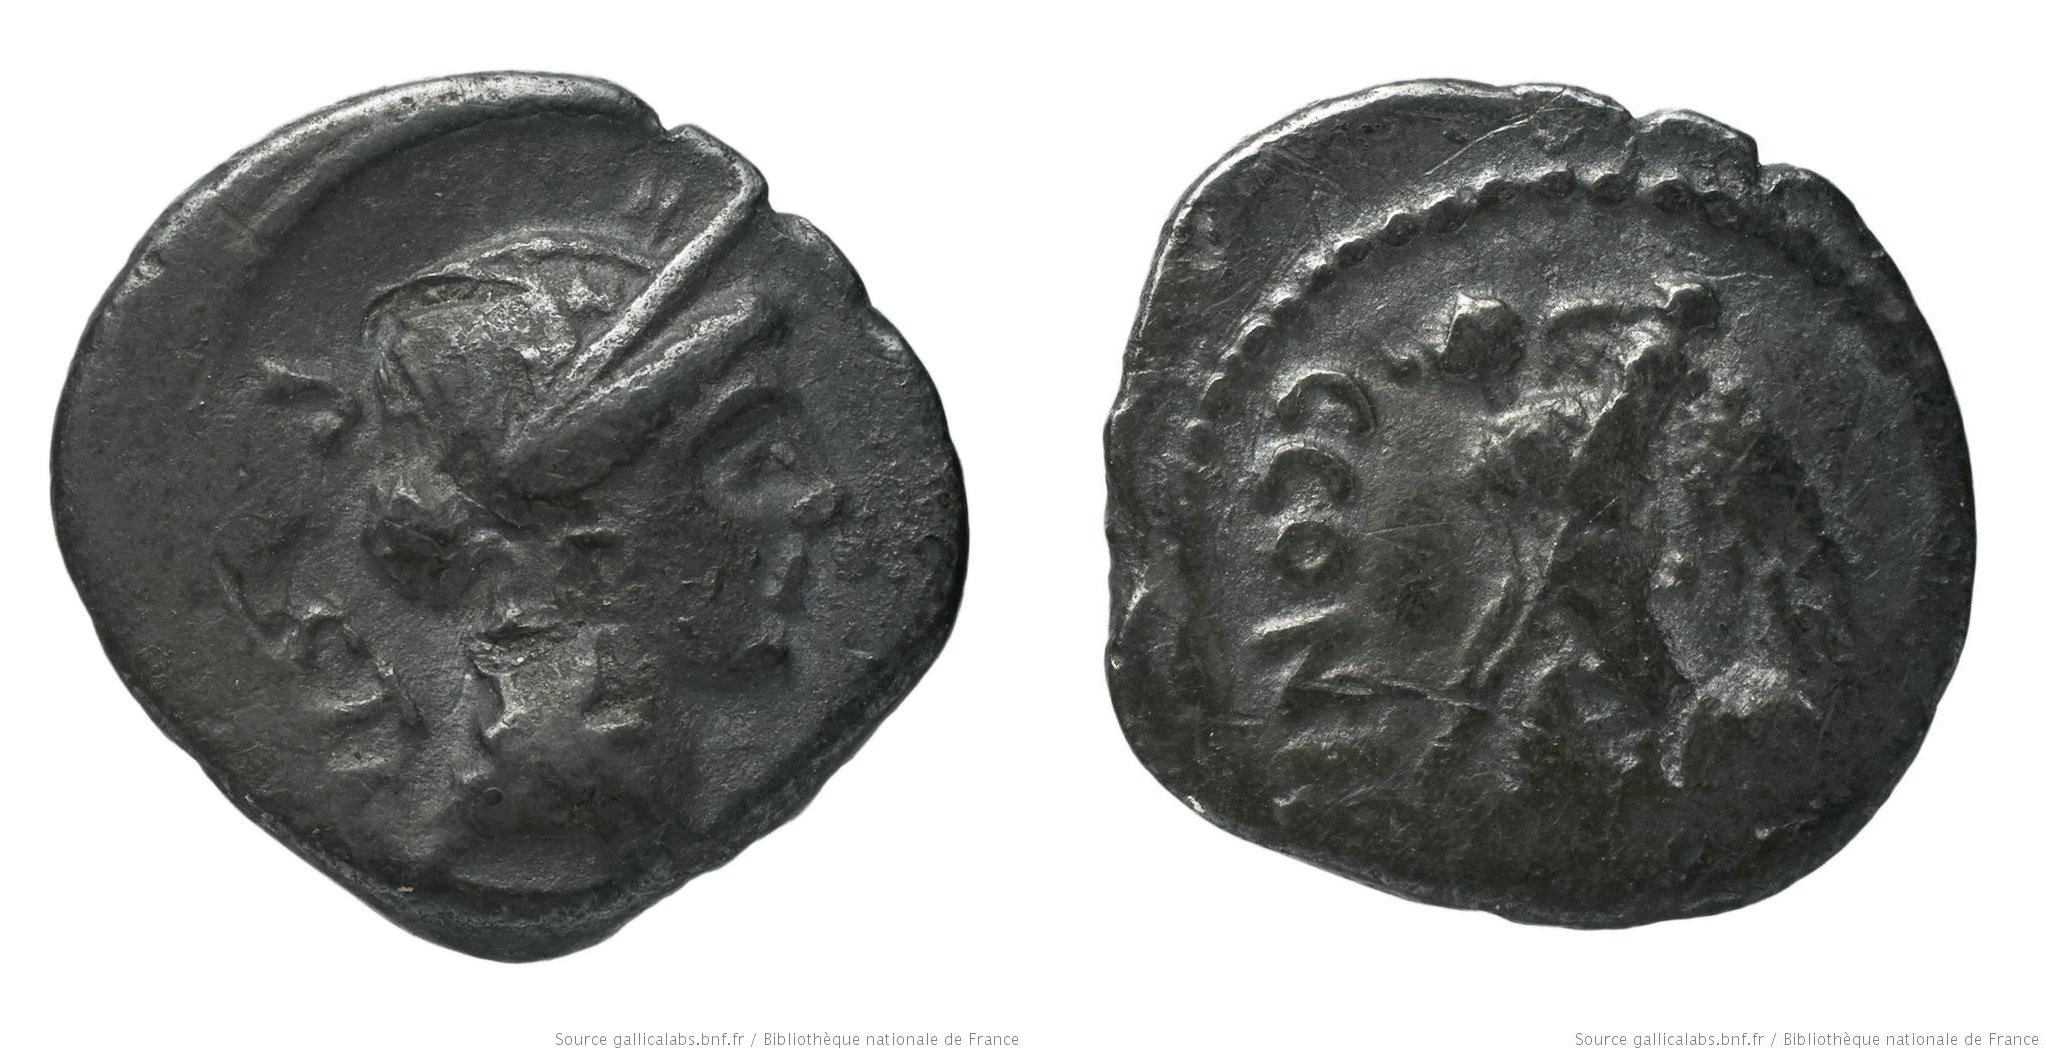 1487CO – Quinaire Considia – Caius Considius Pætus